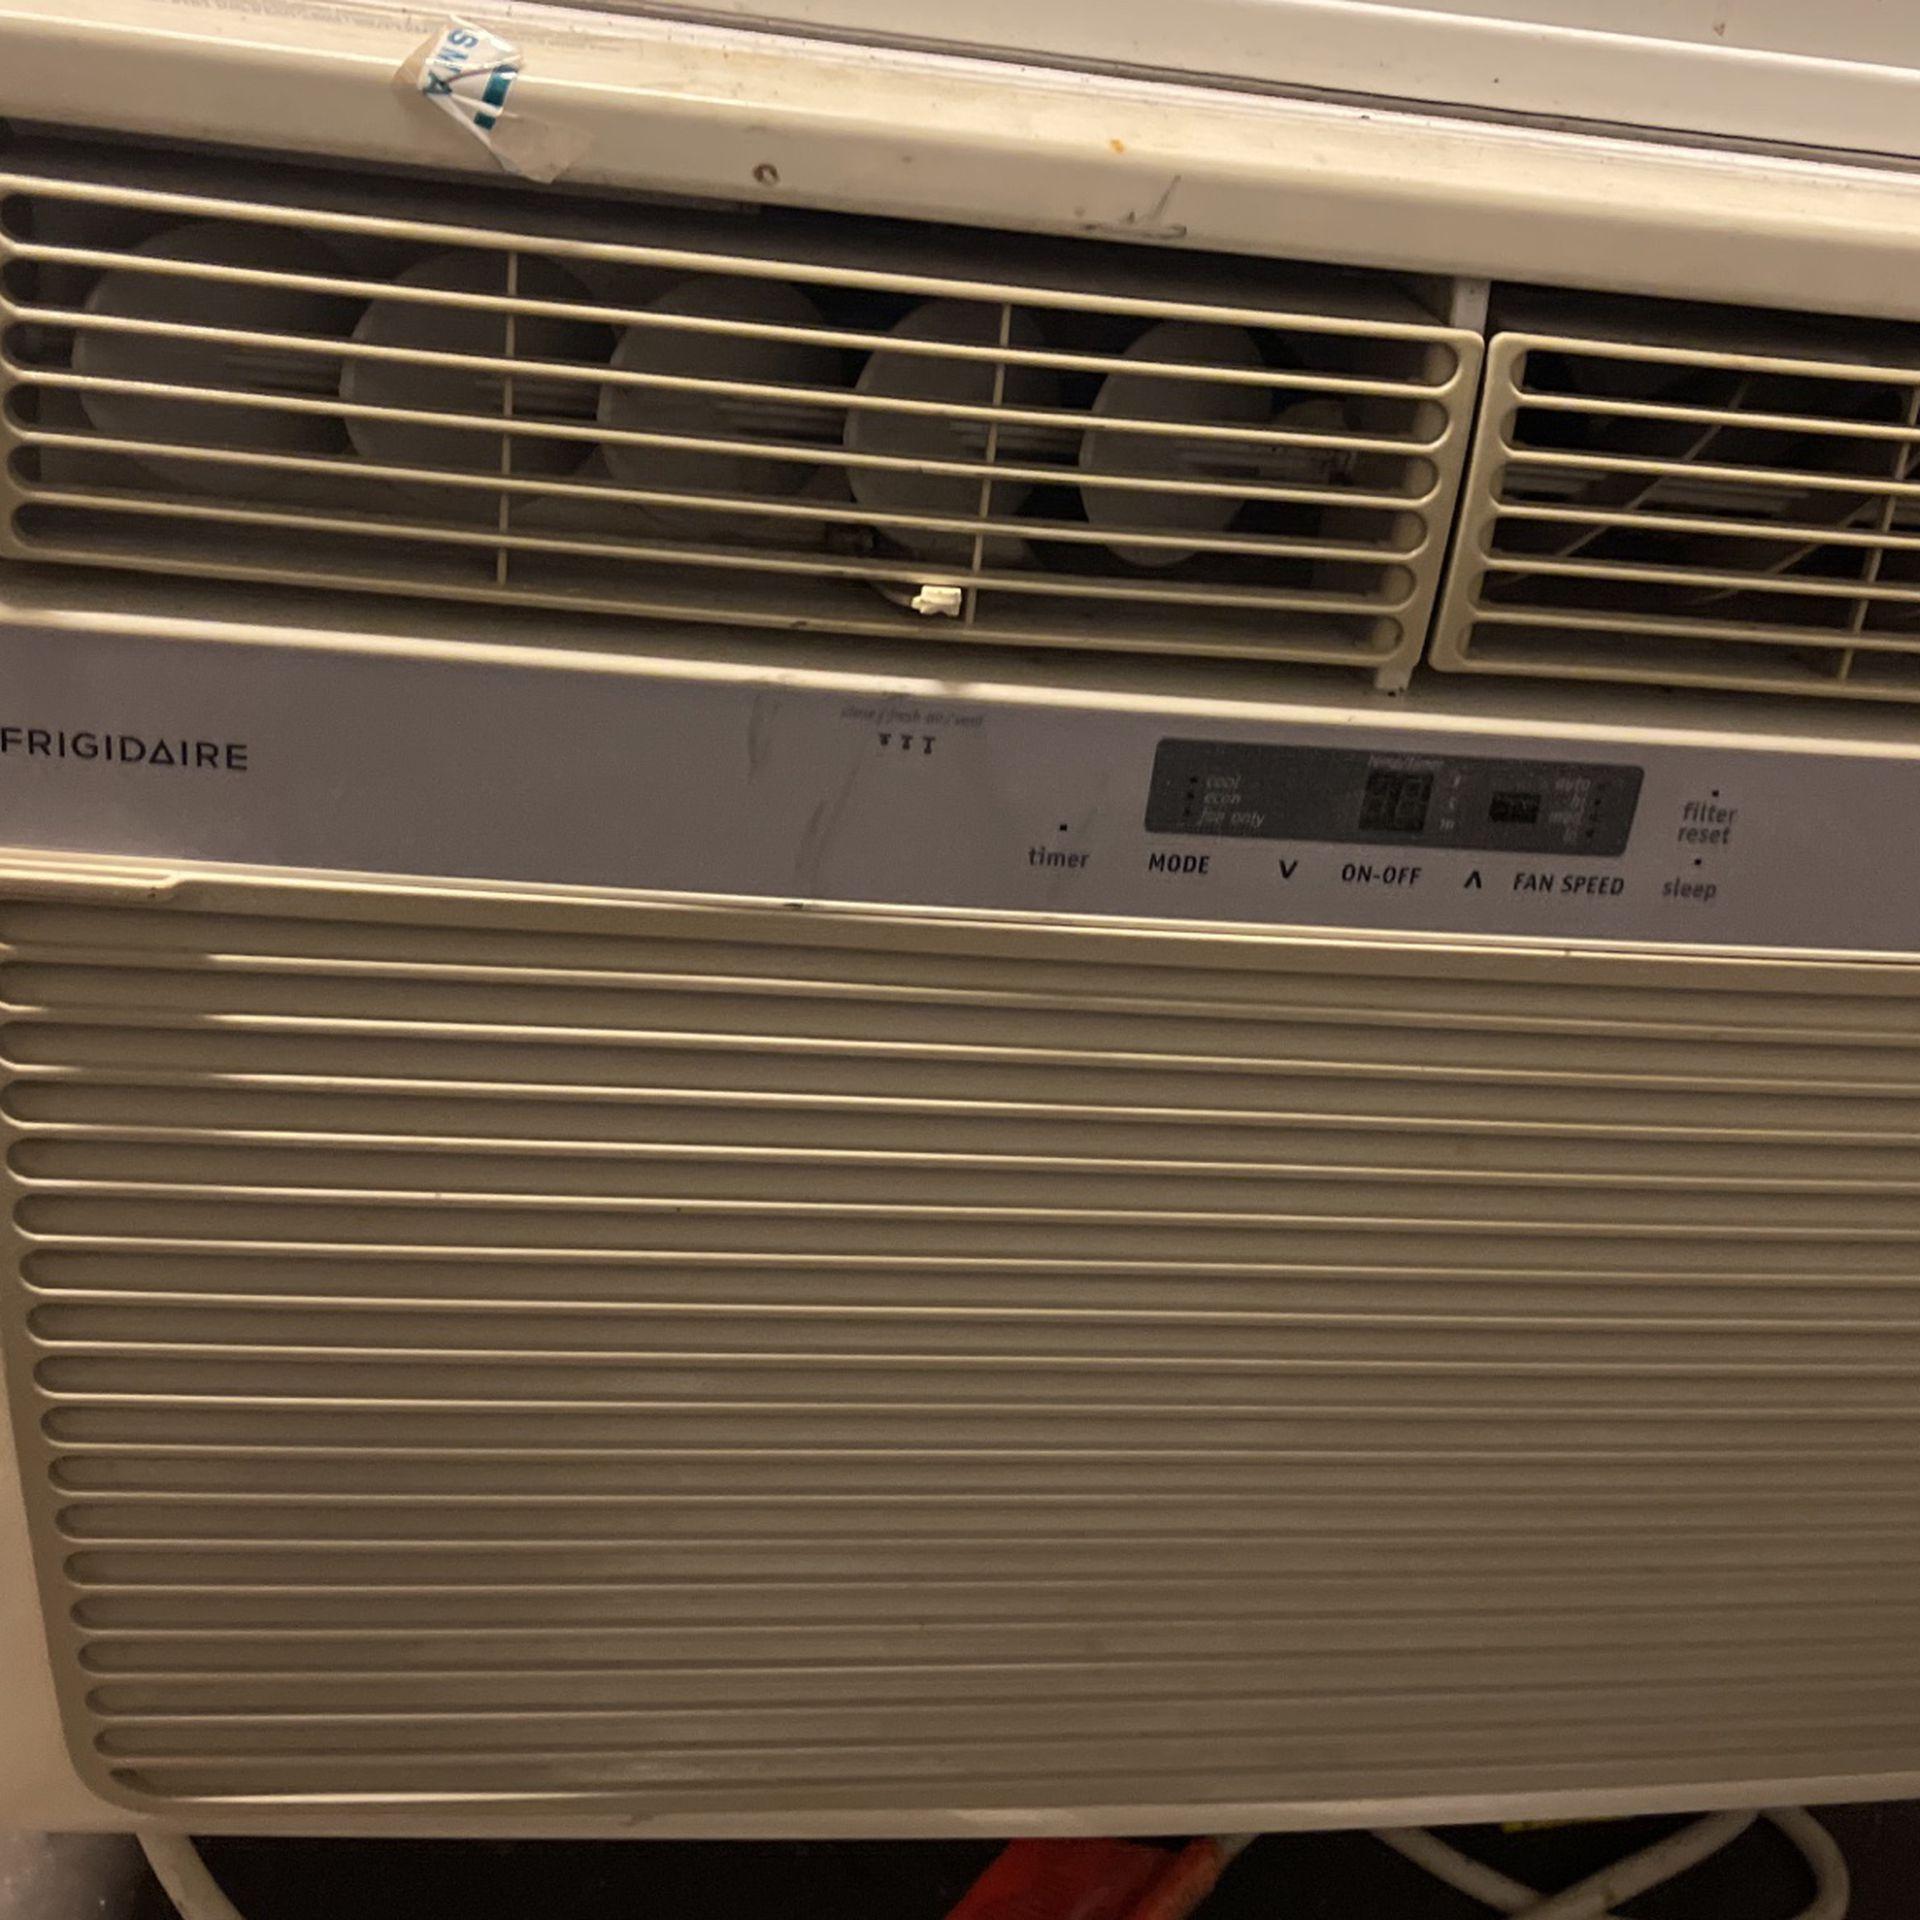 2500 BTU Frigidaire Air Conditioner